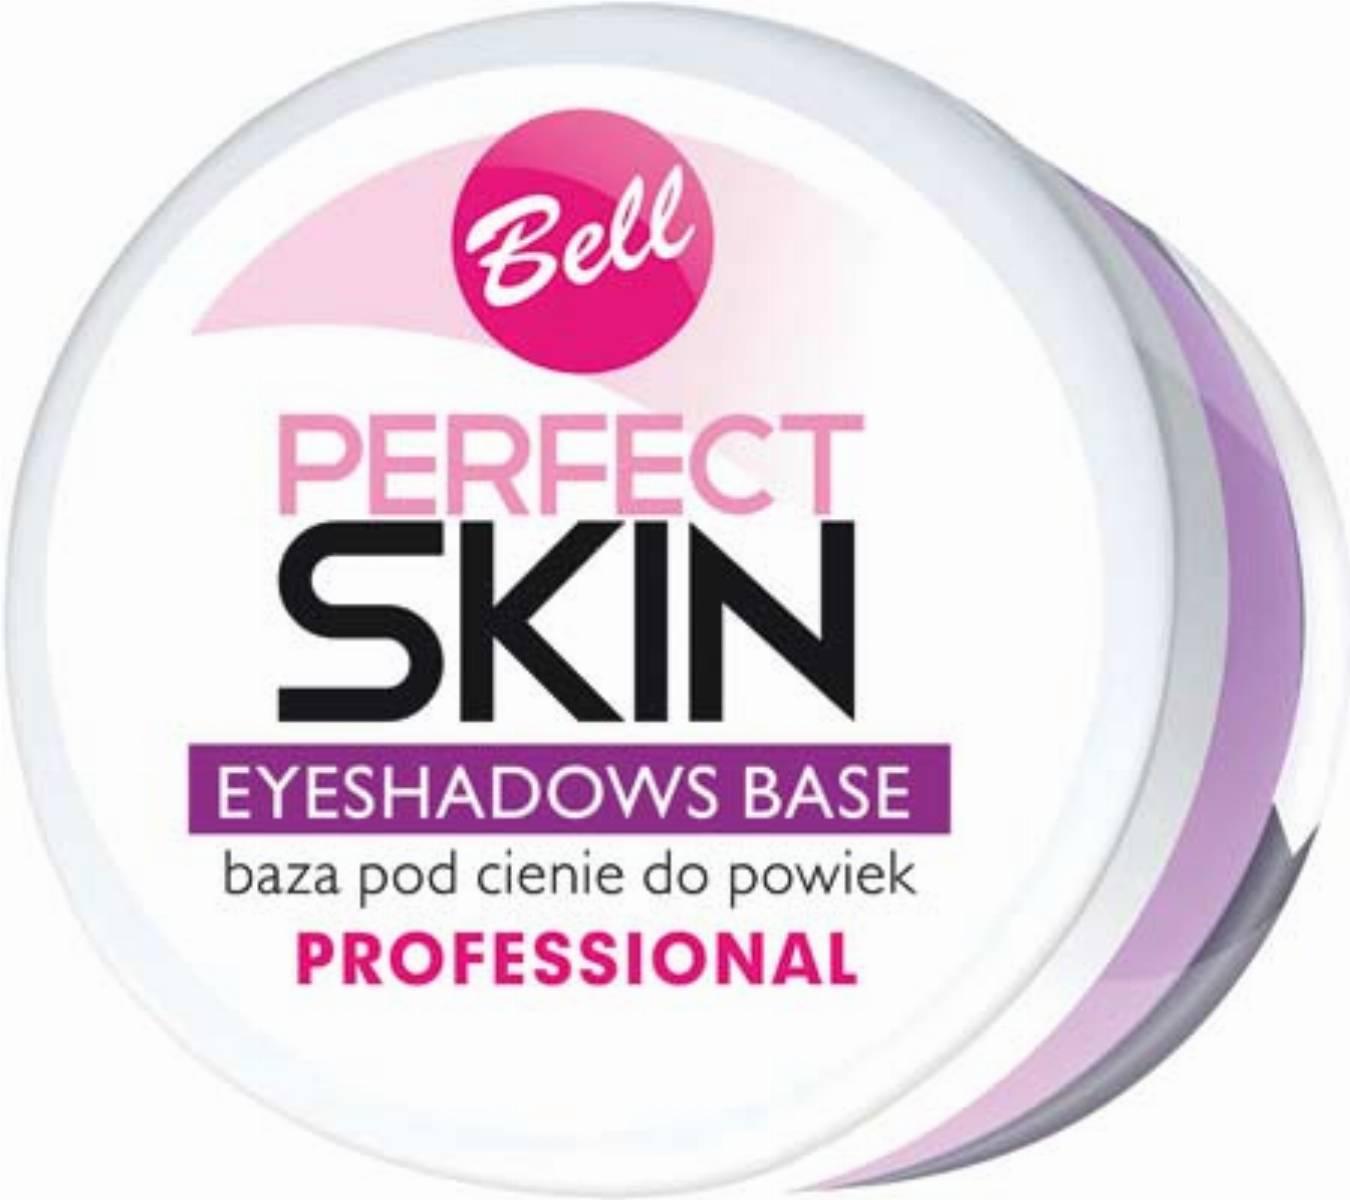 Perfect Skin Professional Eyeshadow Base